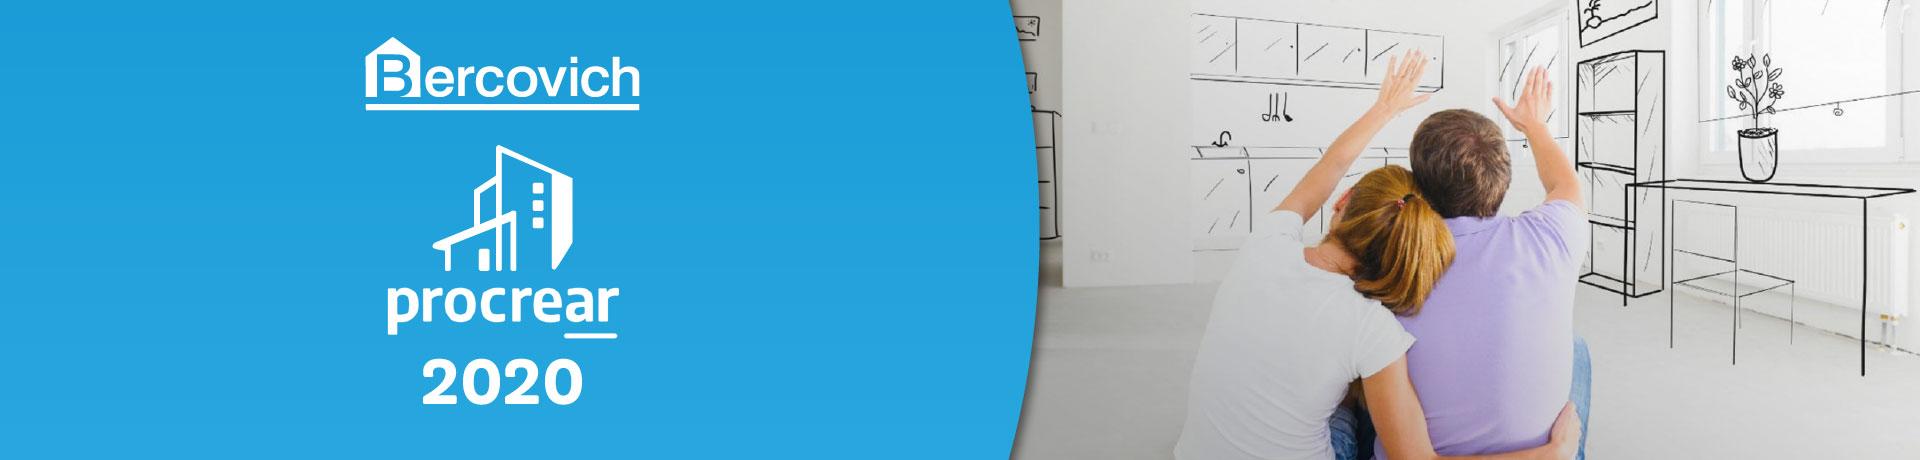 banner-procrear-octubre-desktop